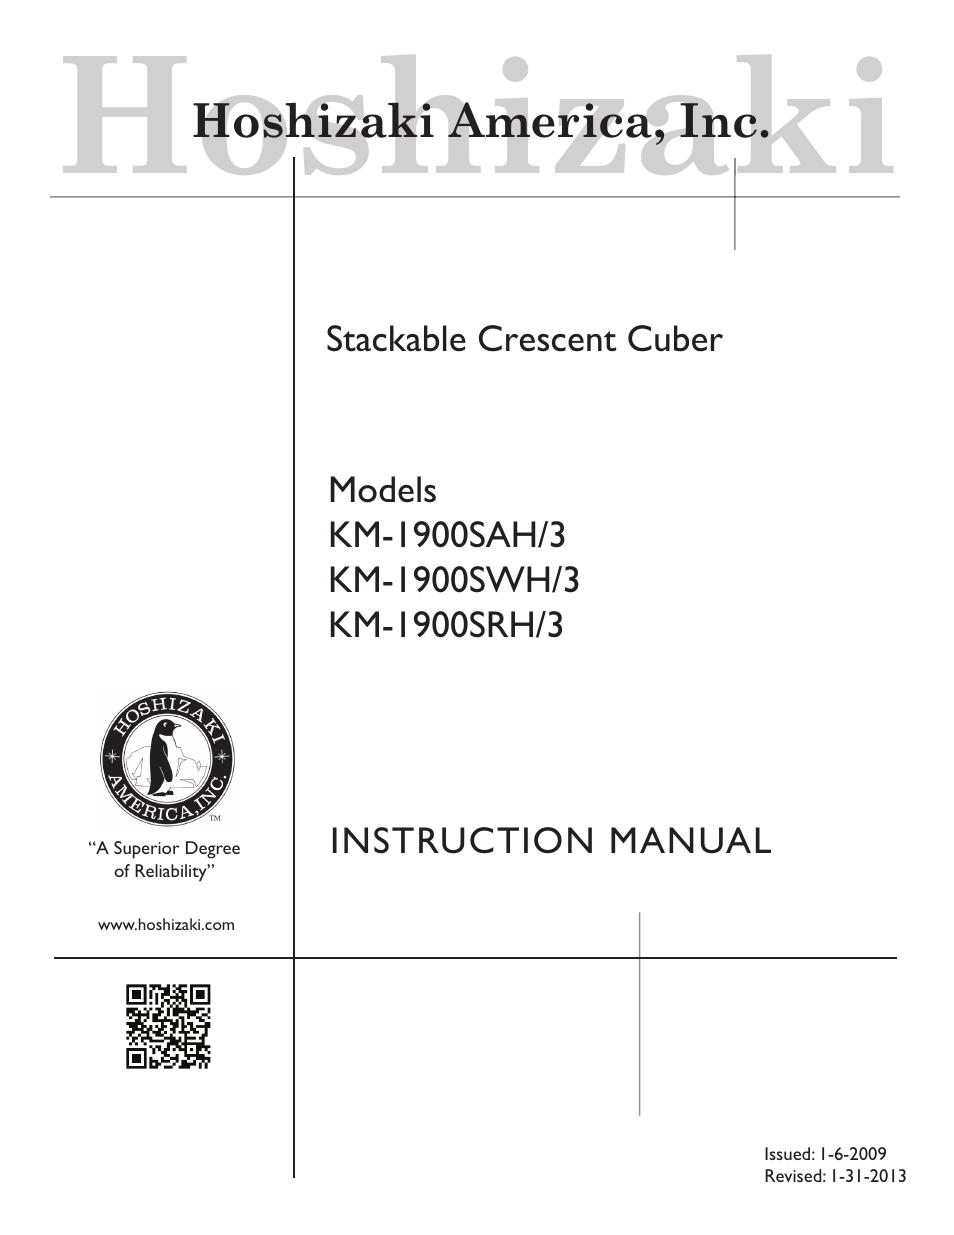 hoshizaki km 1900sah 3 user manual 38 pages also for km 1900swh rh manualsdir com Hoshizaki America Hoshizaki America